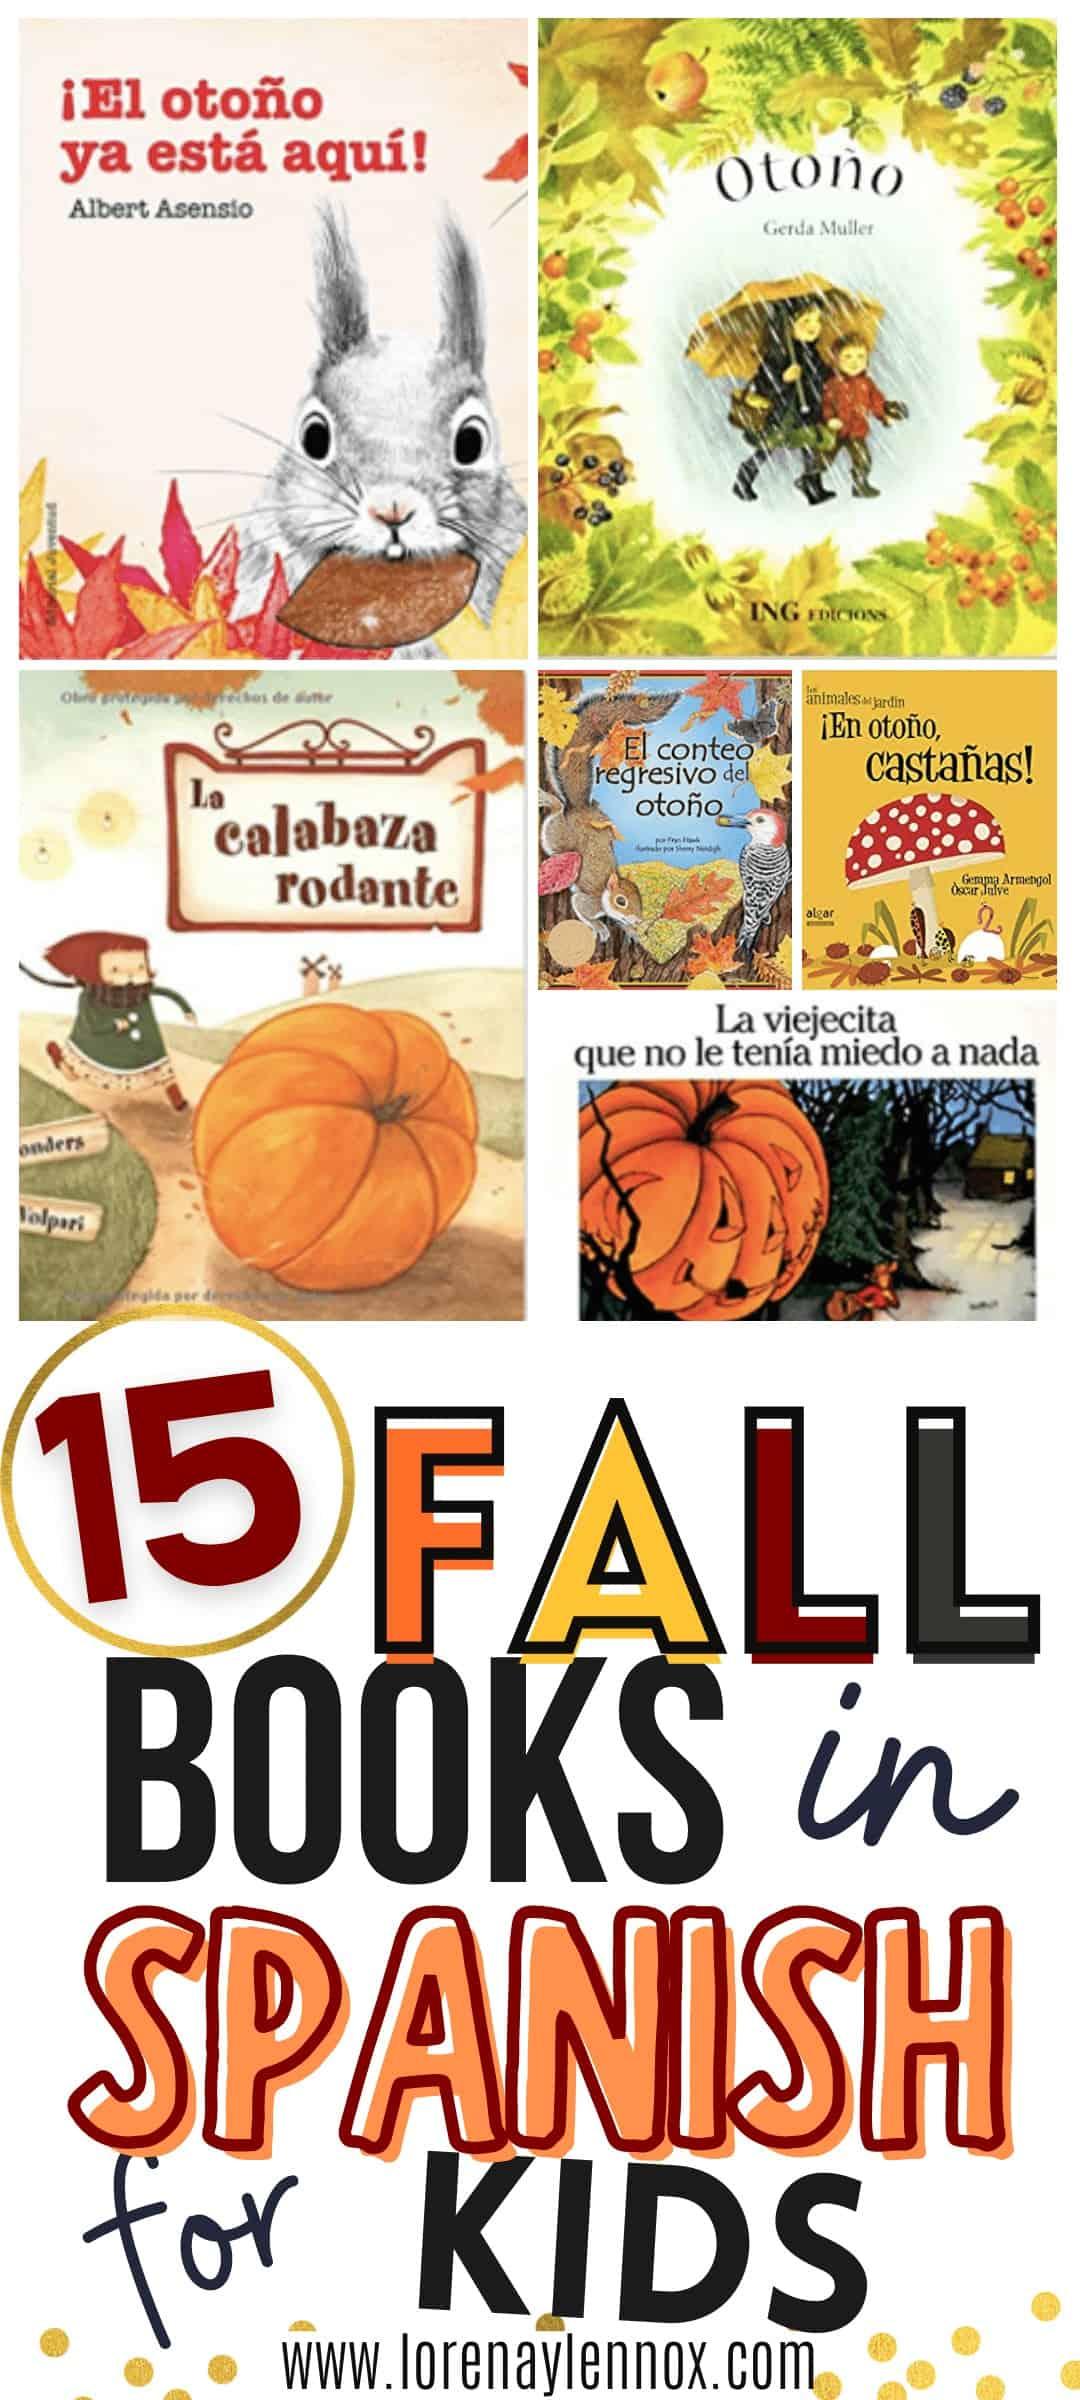 15 Fall Books in Spanish for Preschoolers #booksinspanish #booksforpreschoolers #fallbooksinspanish #librosinfantiles #librosparaniños